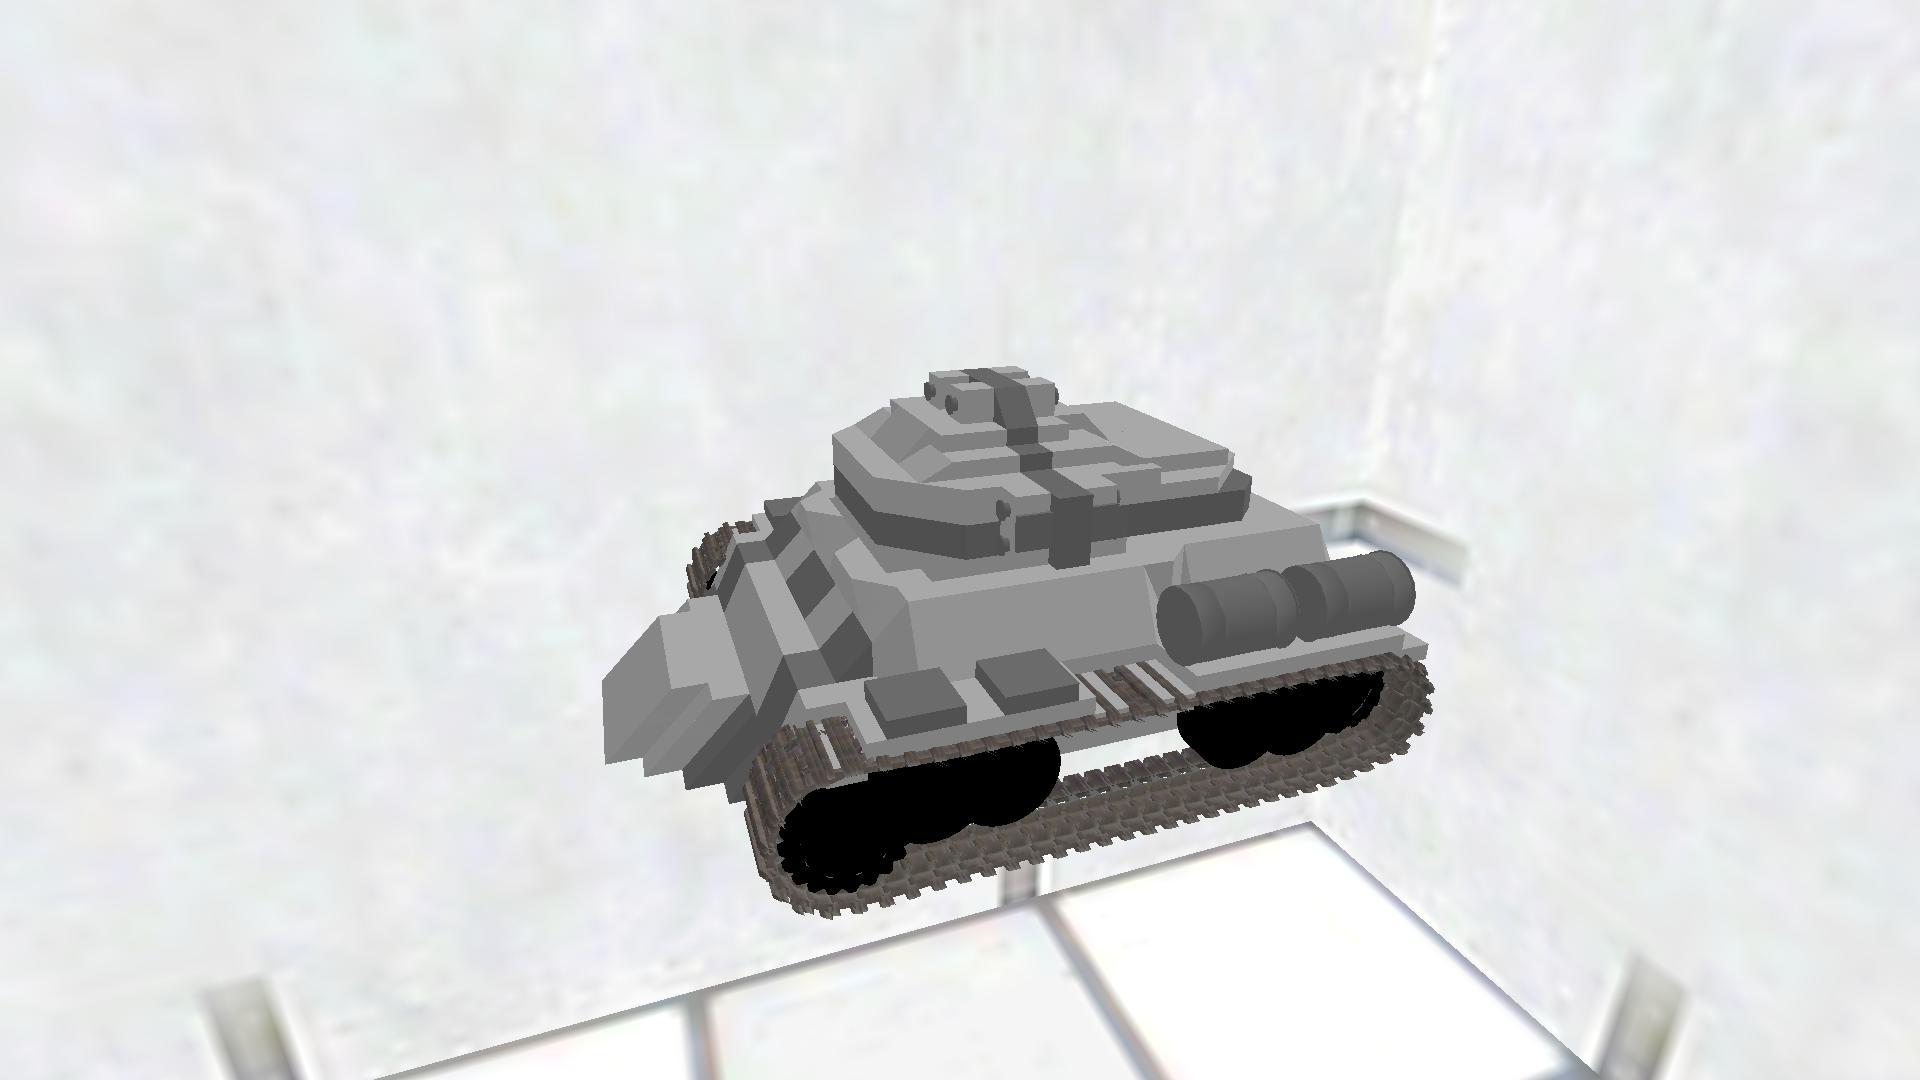 Missle tank